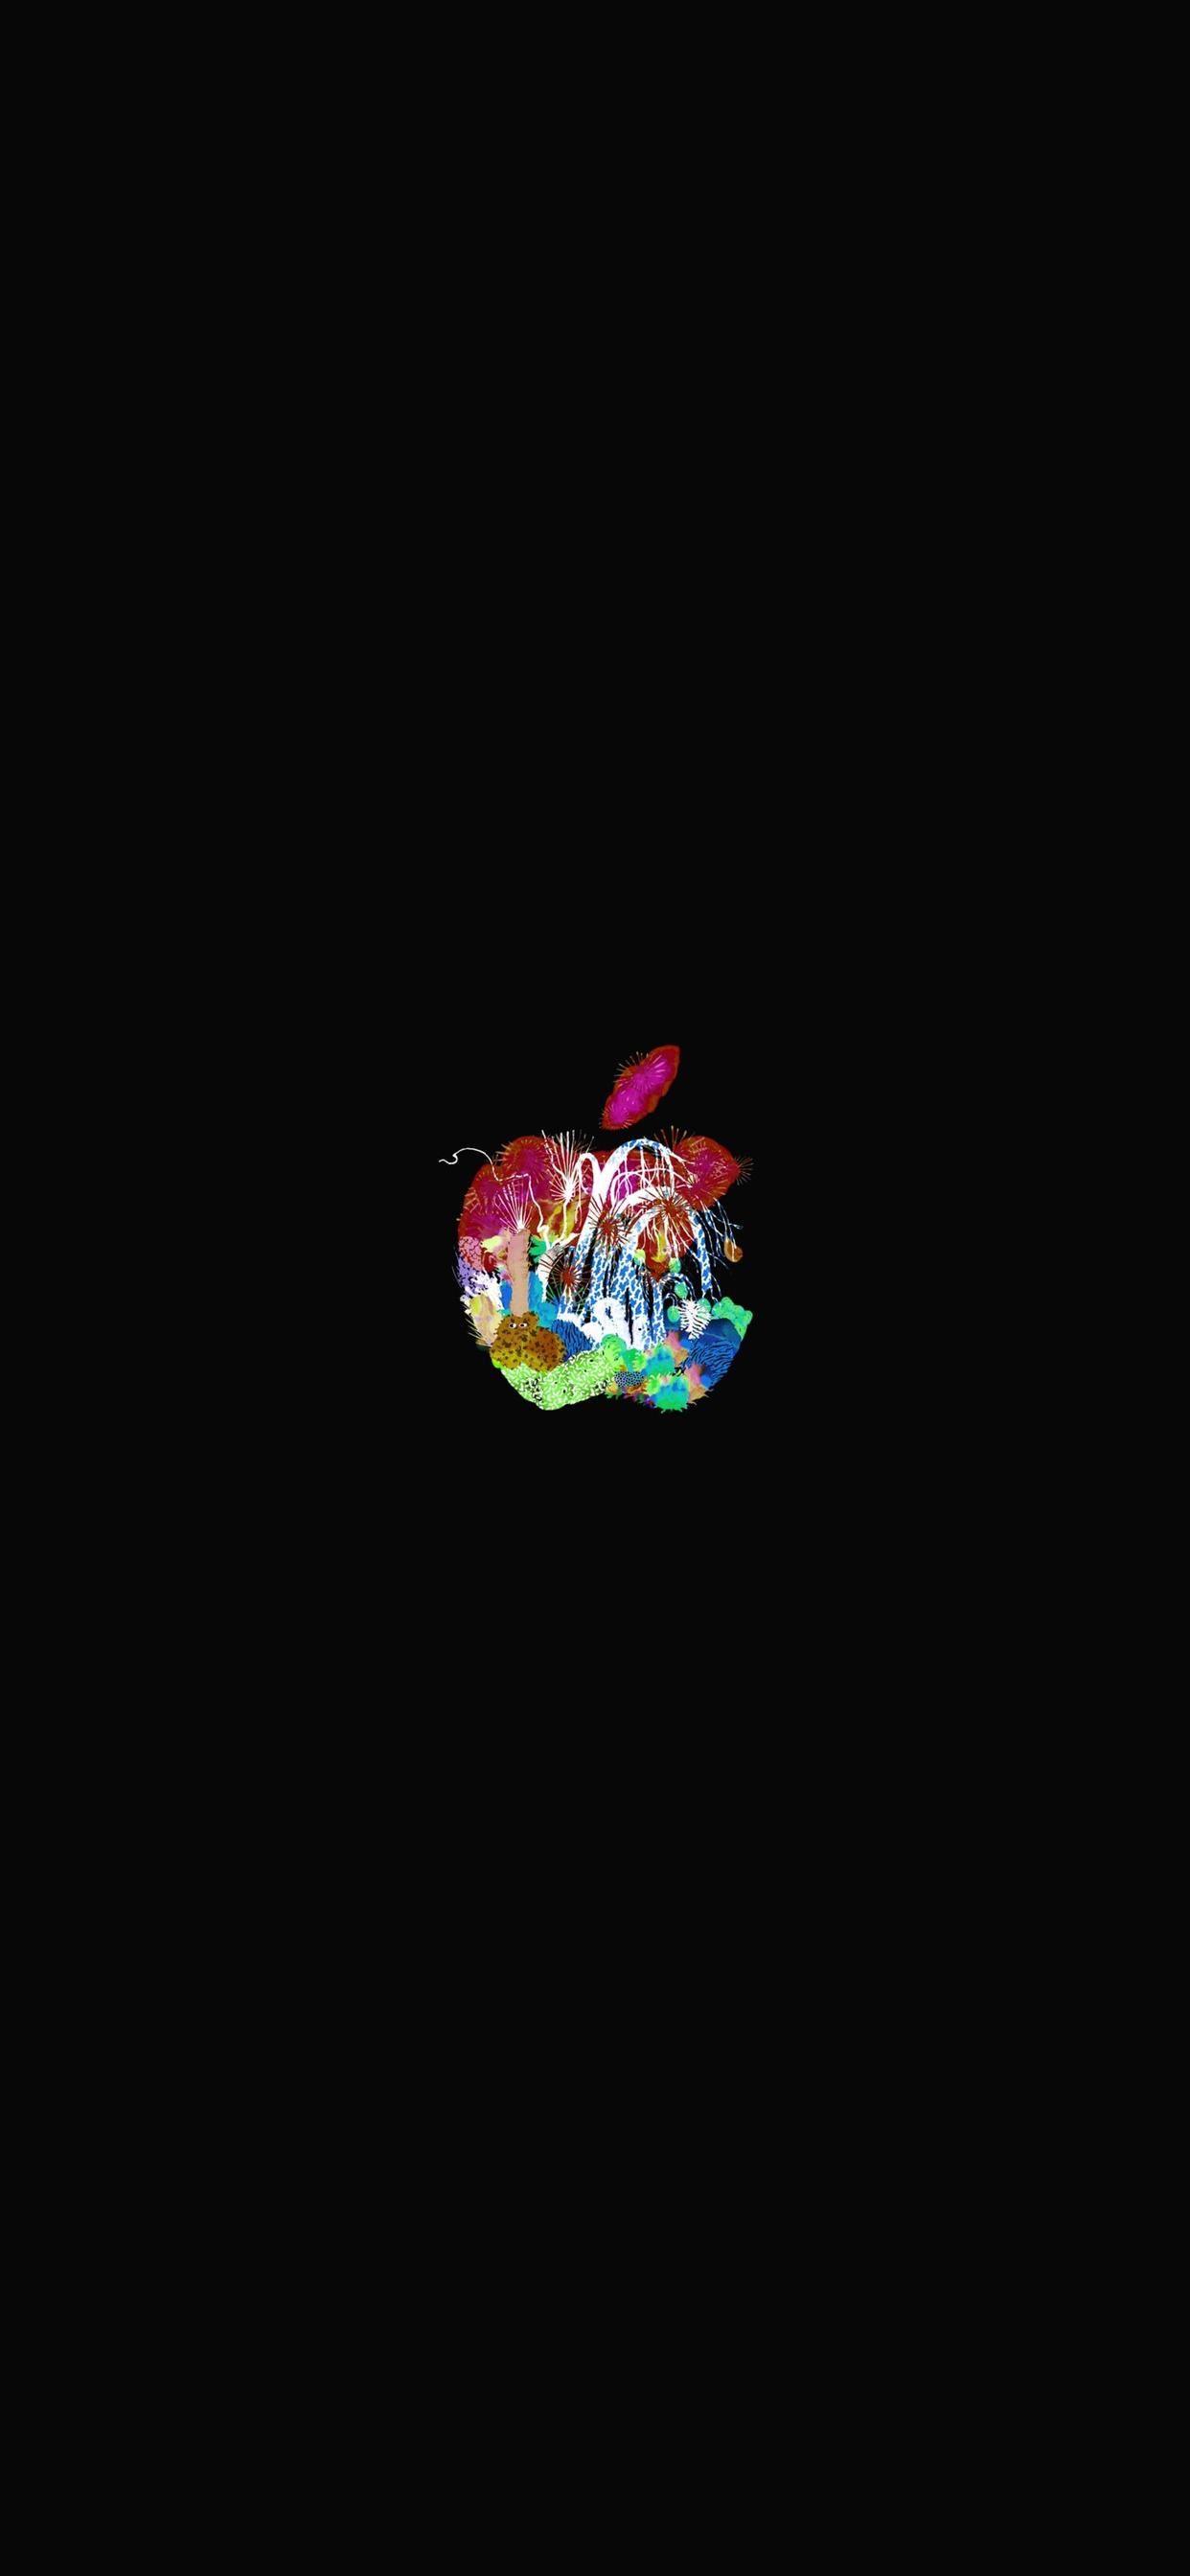 iPhone wallpaper apple logo 21 Apple logo